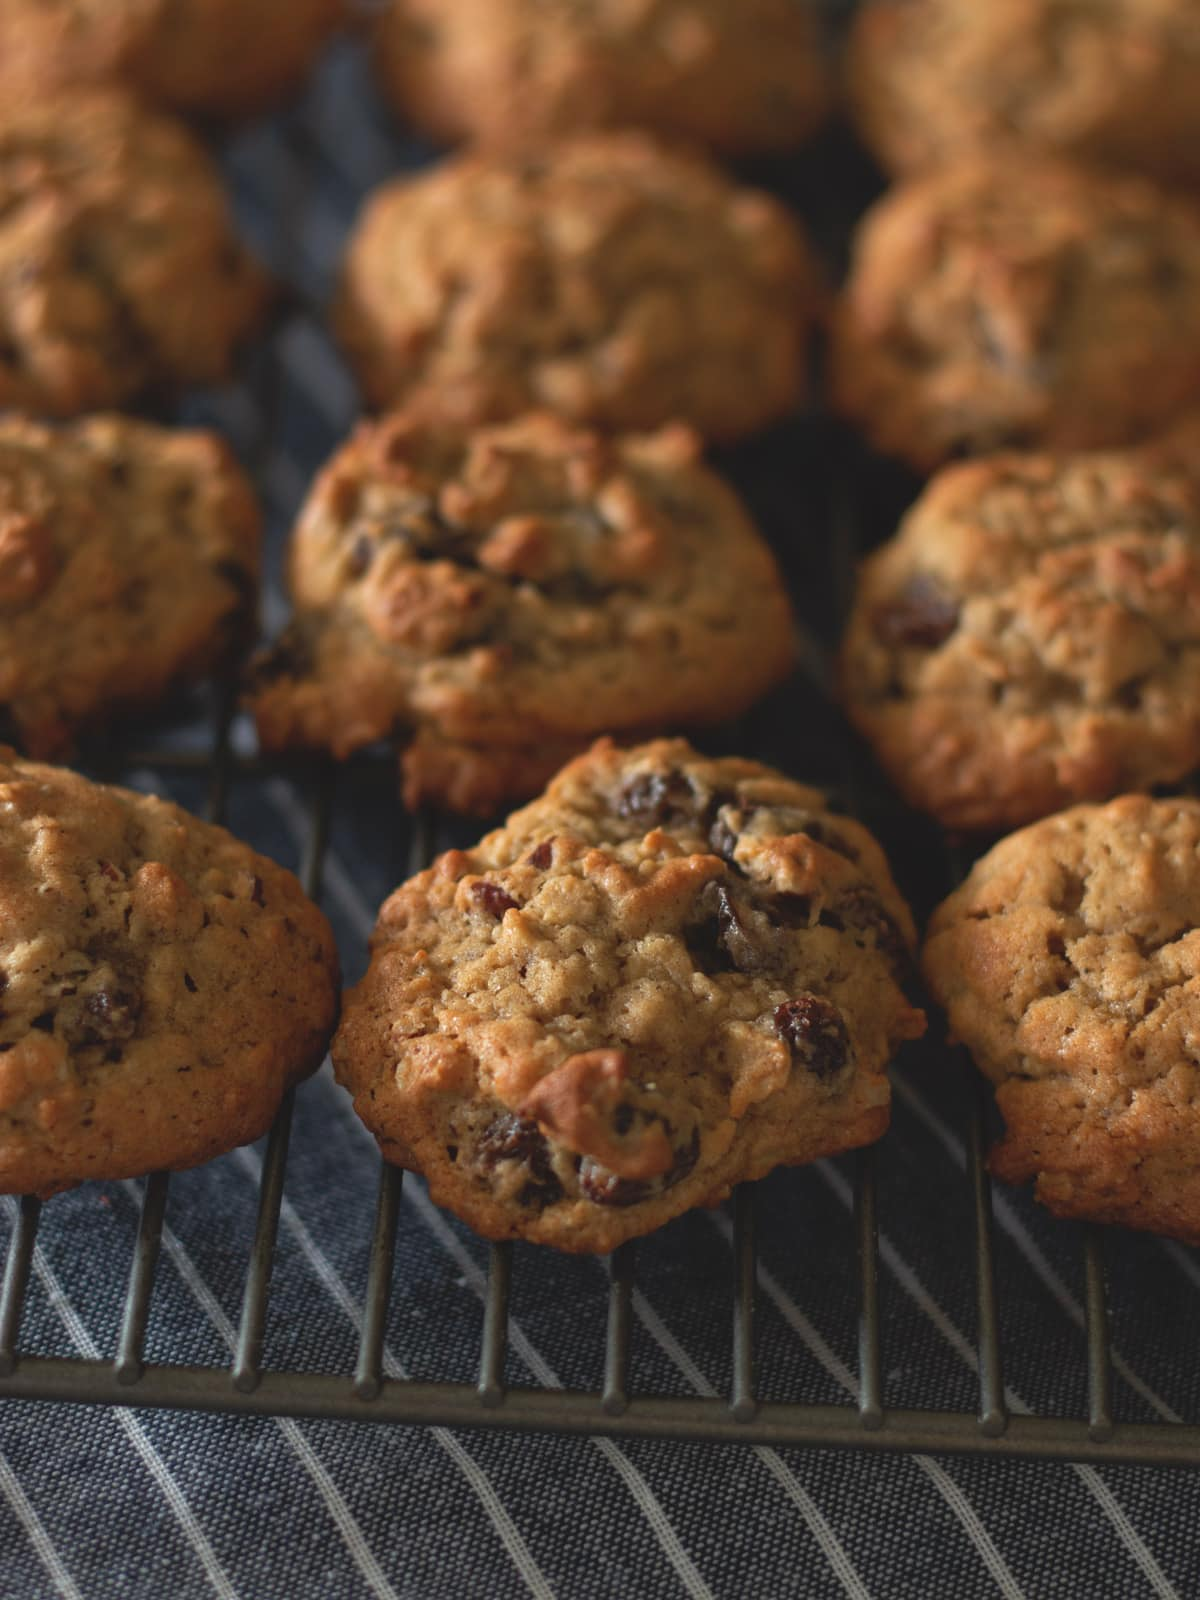 Oatmeal Raisin Cookies, cooling on a rack.